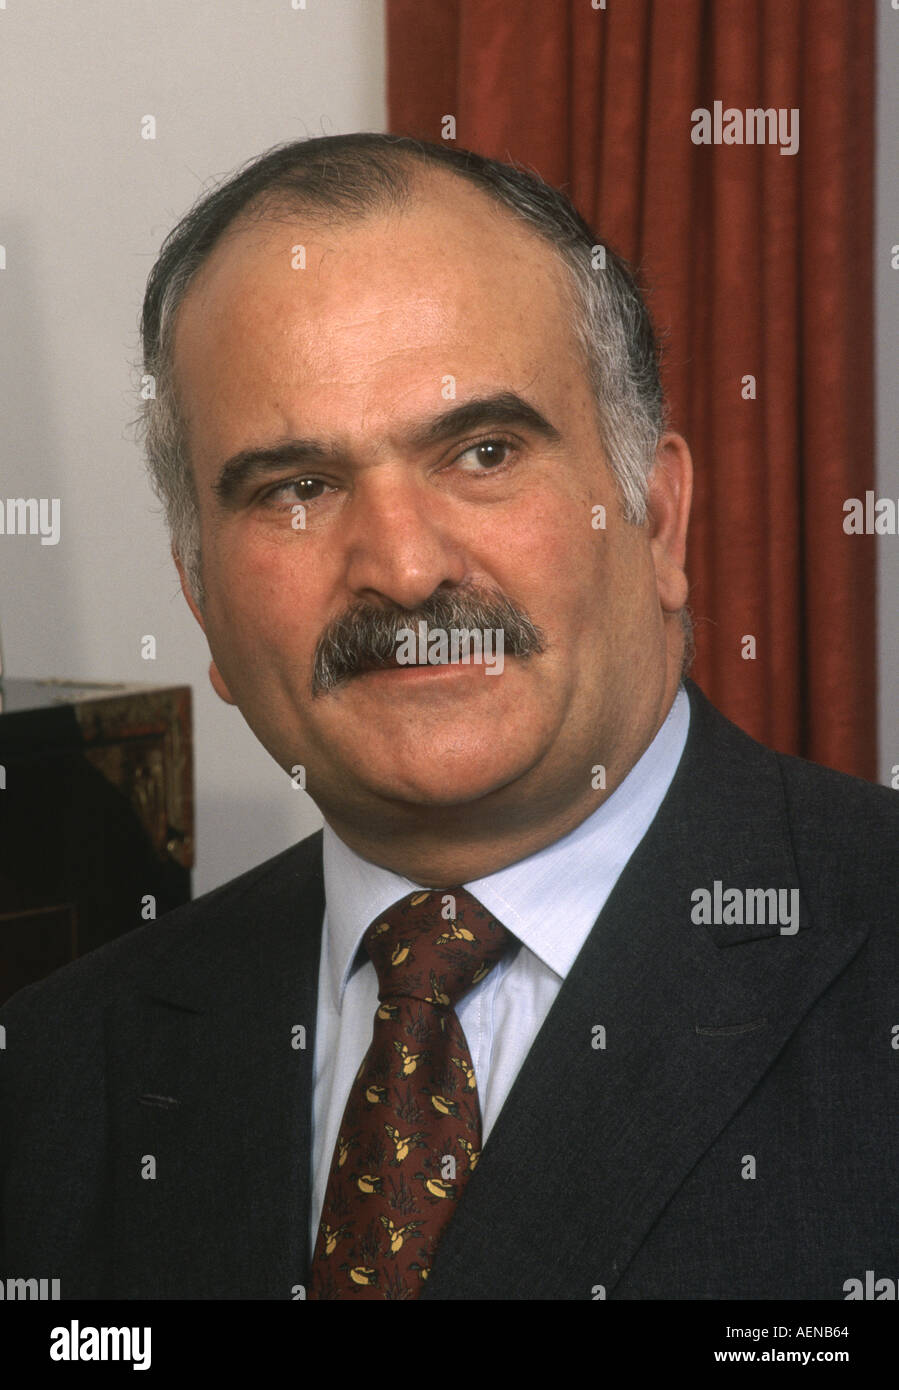 Prince Hassan bin Talal of the Hashemite Kingdom of Jordan Stock Photo